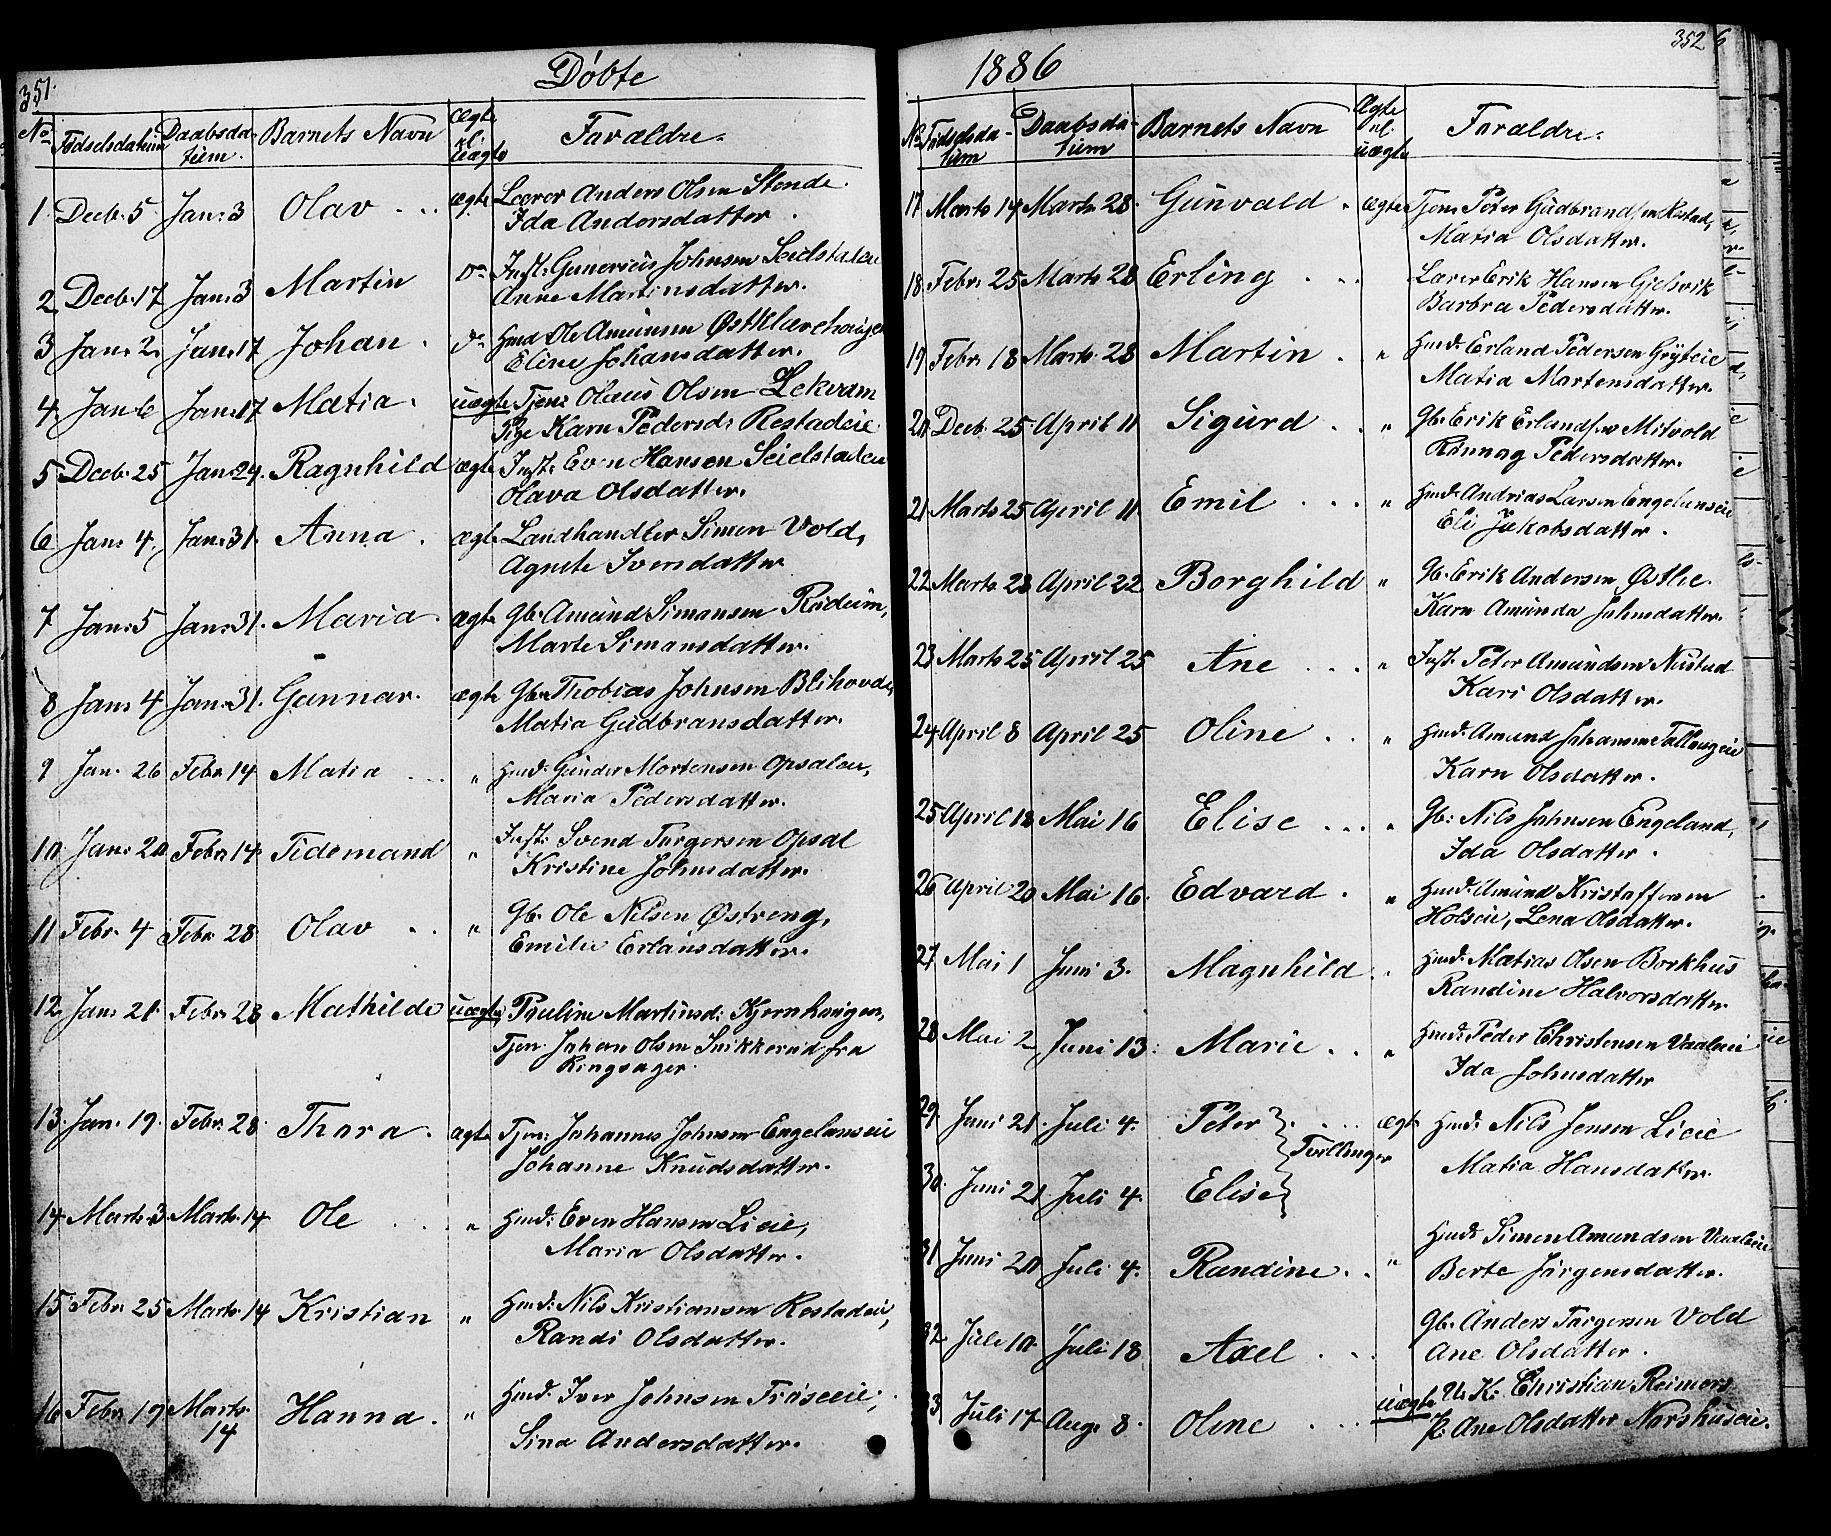 SAH, Østre Gausdal prestekontor, Klokkerbok nr. 1, 1863-1893, s. 351-352